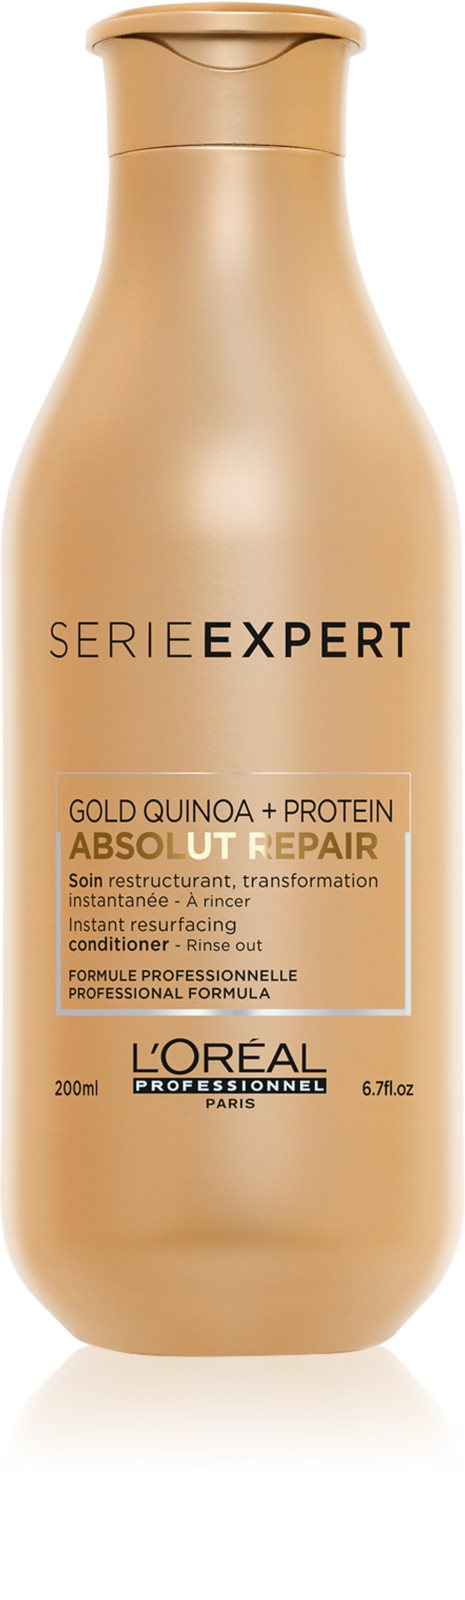 L'Oréal Professionnel Série Expert Absolut Repair Conditioner - regeneračný kondicionér pre poškodené vlasy